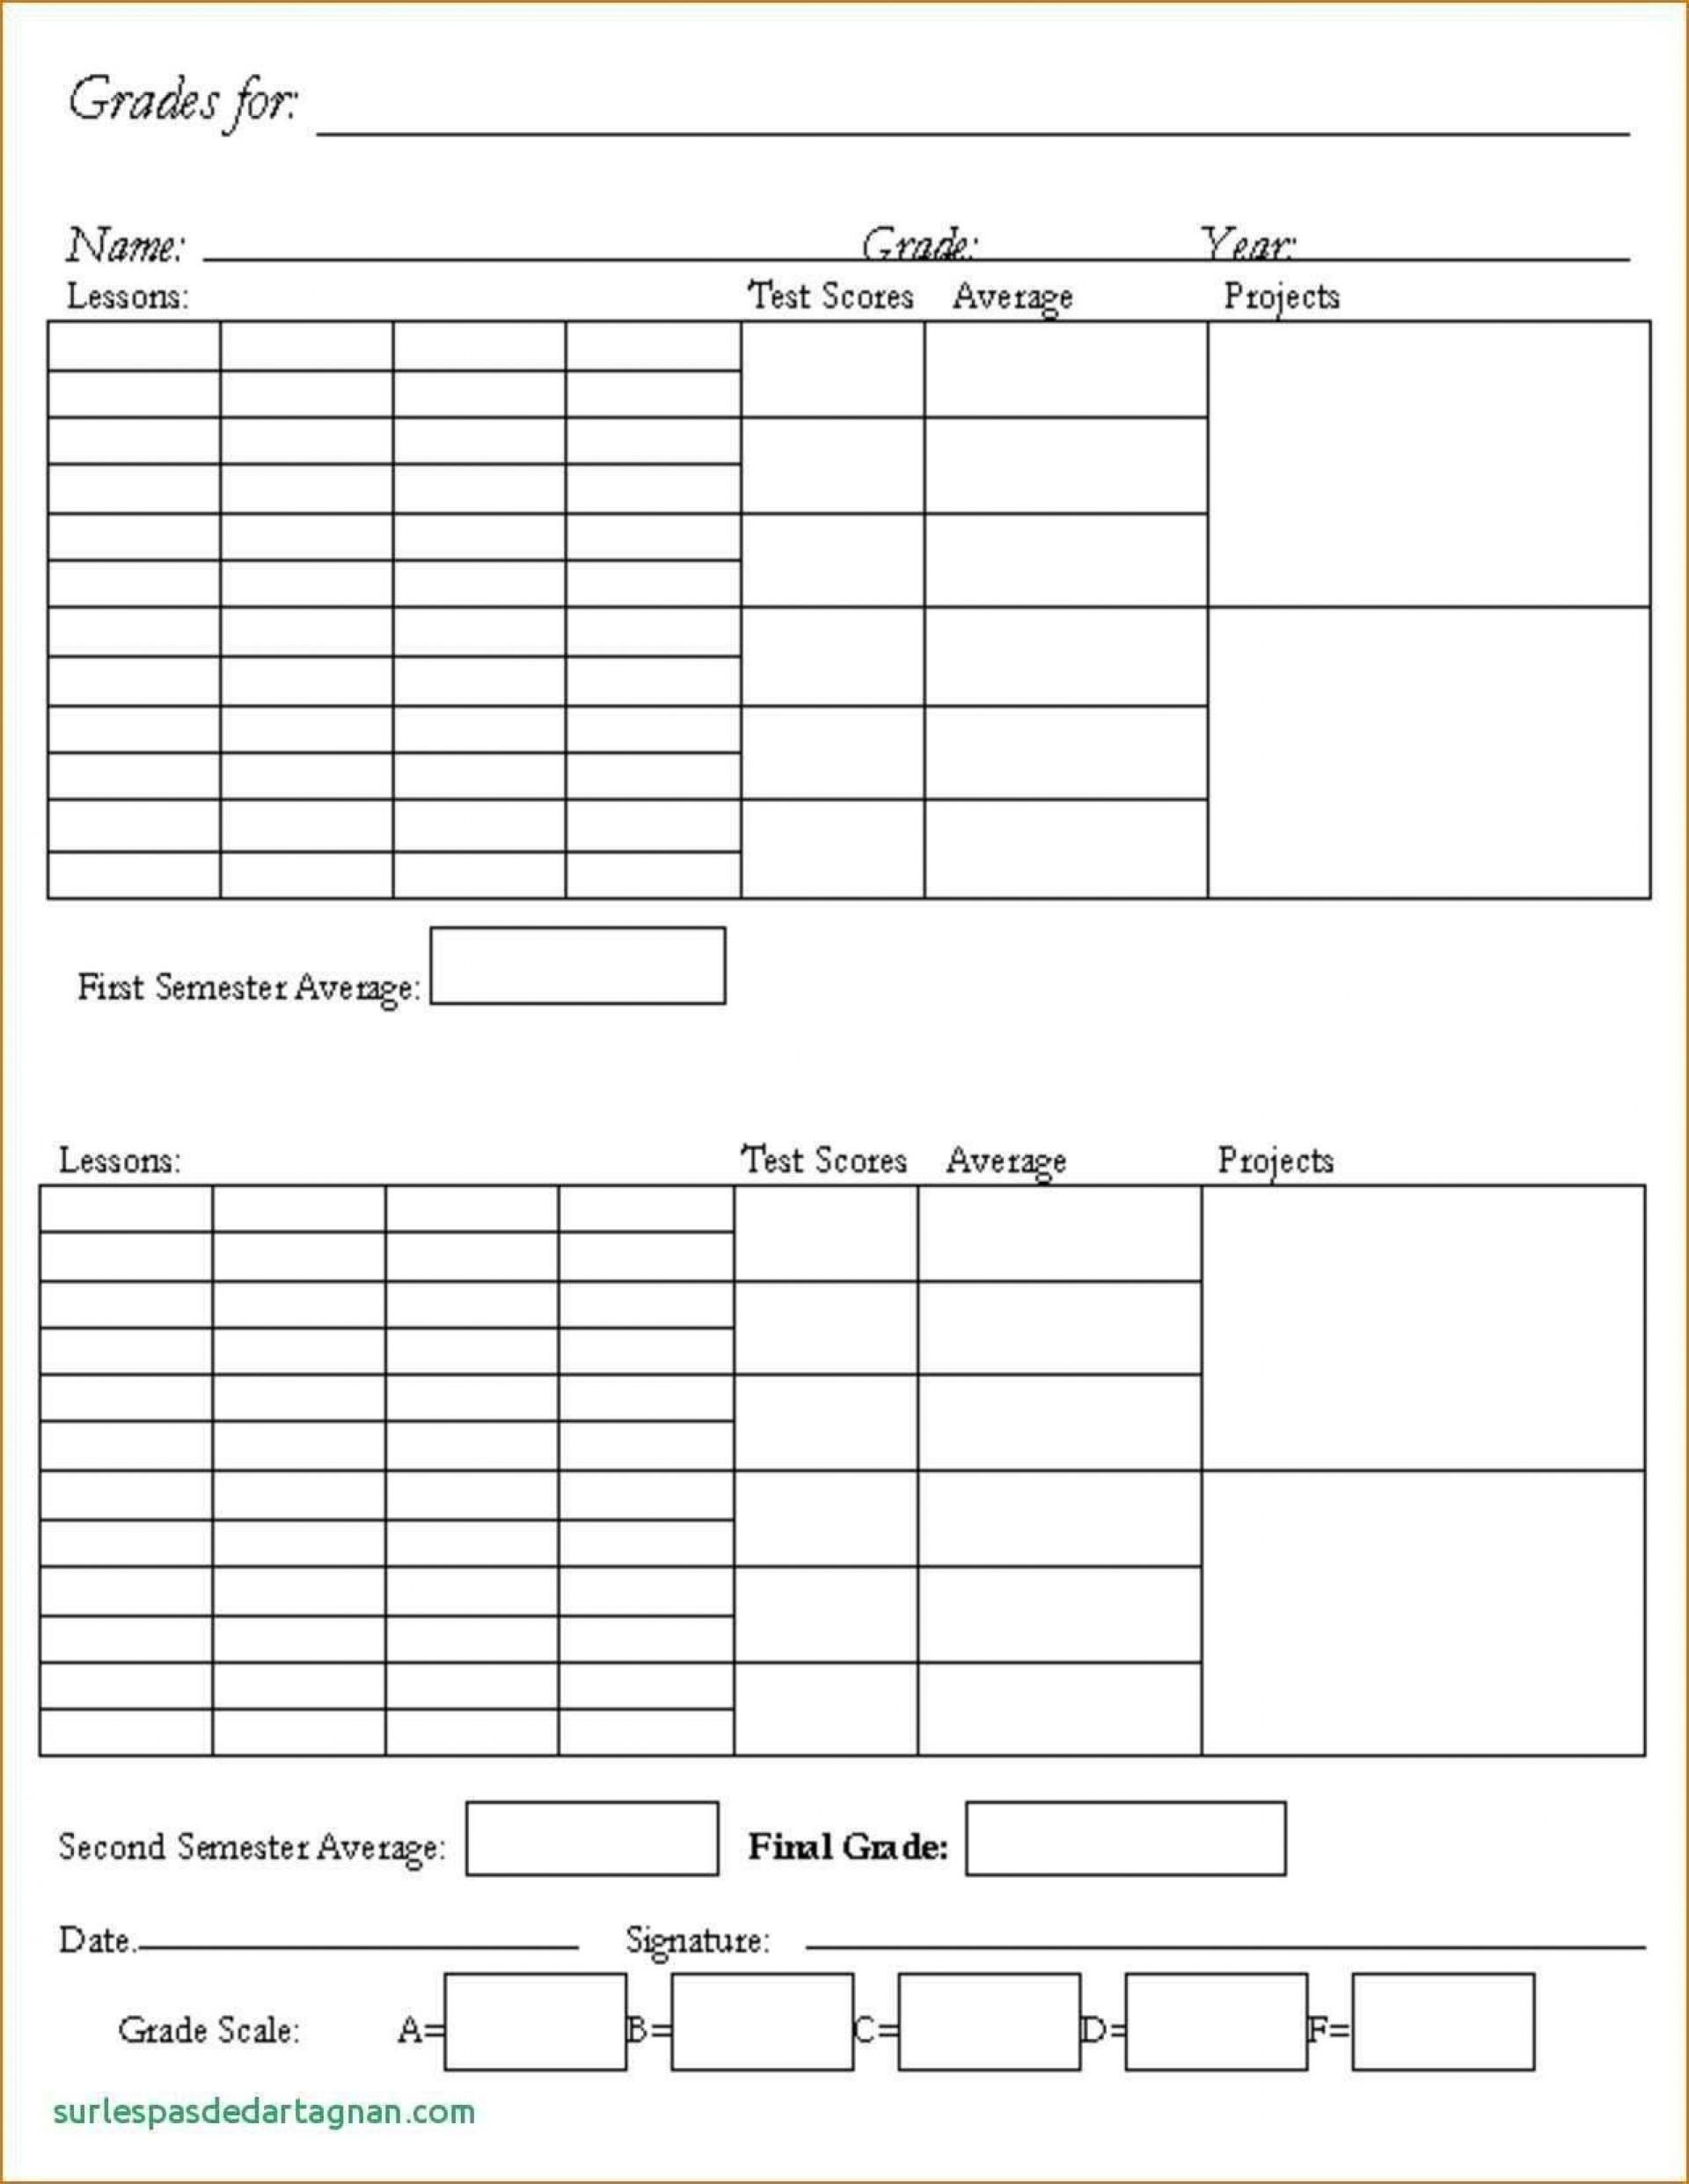 002 Unforgettable Homeschool Middle School Report Card Template Design  8th Grade Transcript1920